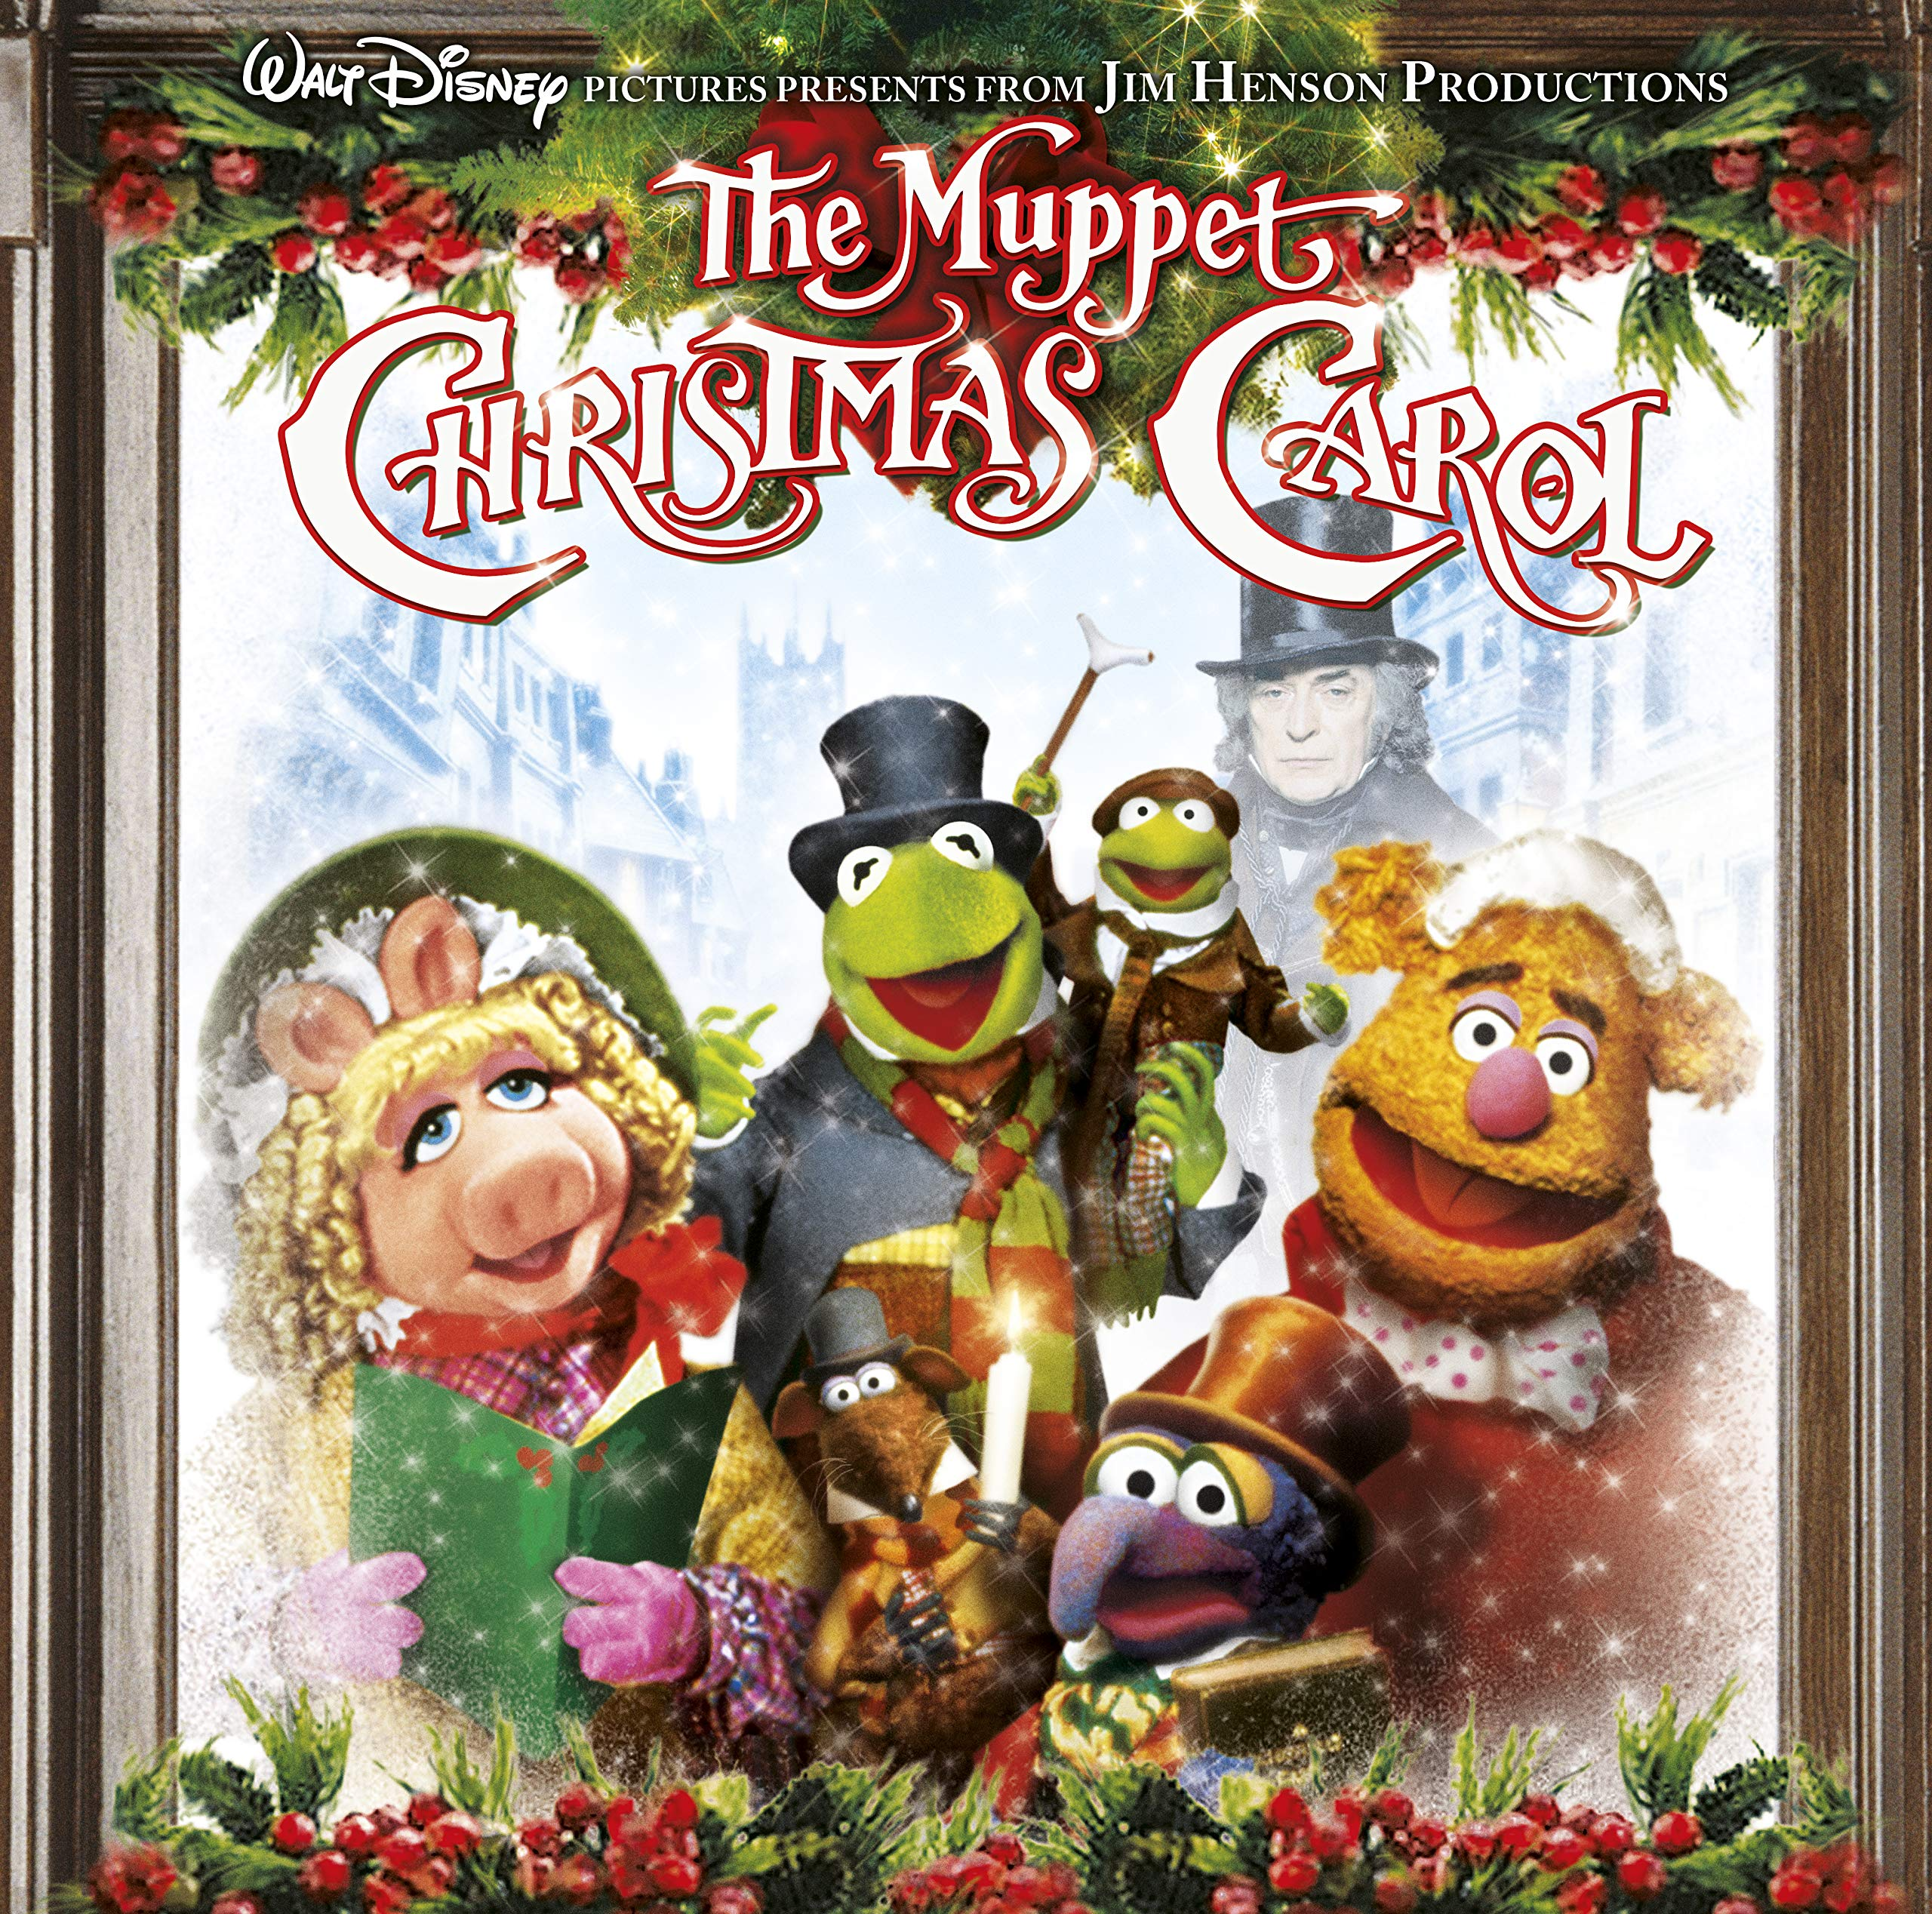 Vinilo : MUPPET CHRISTMAS CAROL / O.S.T. - Muppet Christmas Carol (original Soundtrack) (United Kingdom - Import)